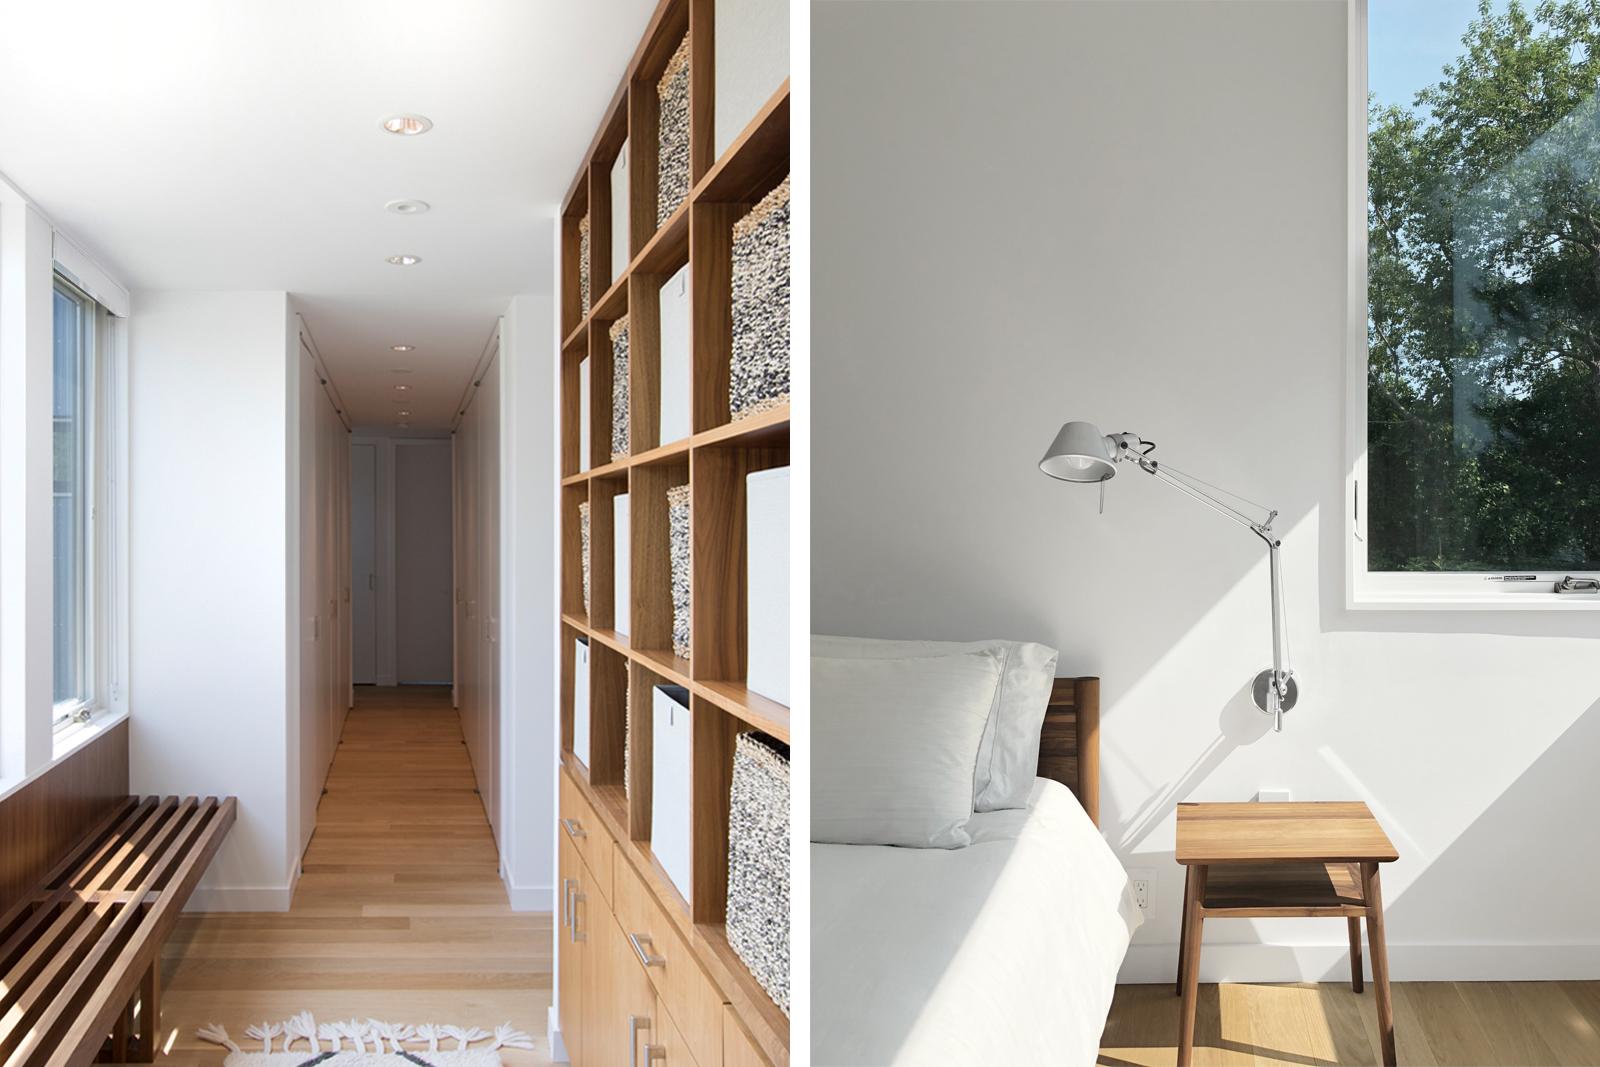 19-res4-resolution-4-architecture-modern-modular-house-prefab-home-north-fork-bluff-house-interior-entry-foyer-hallway-bedroom.jpg